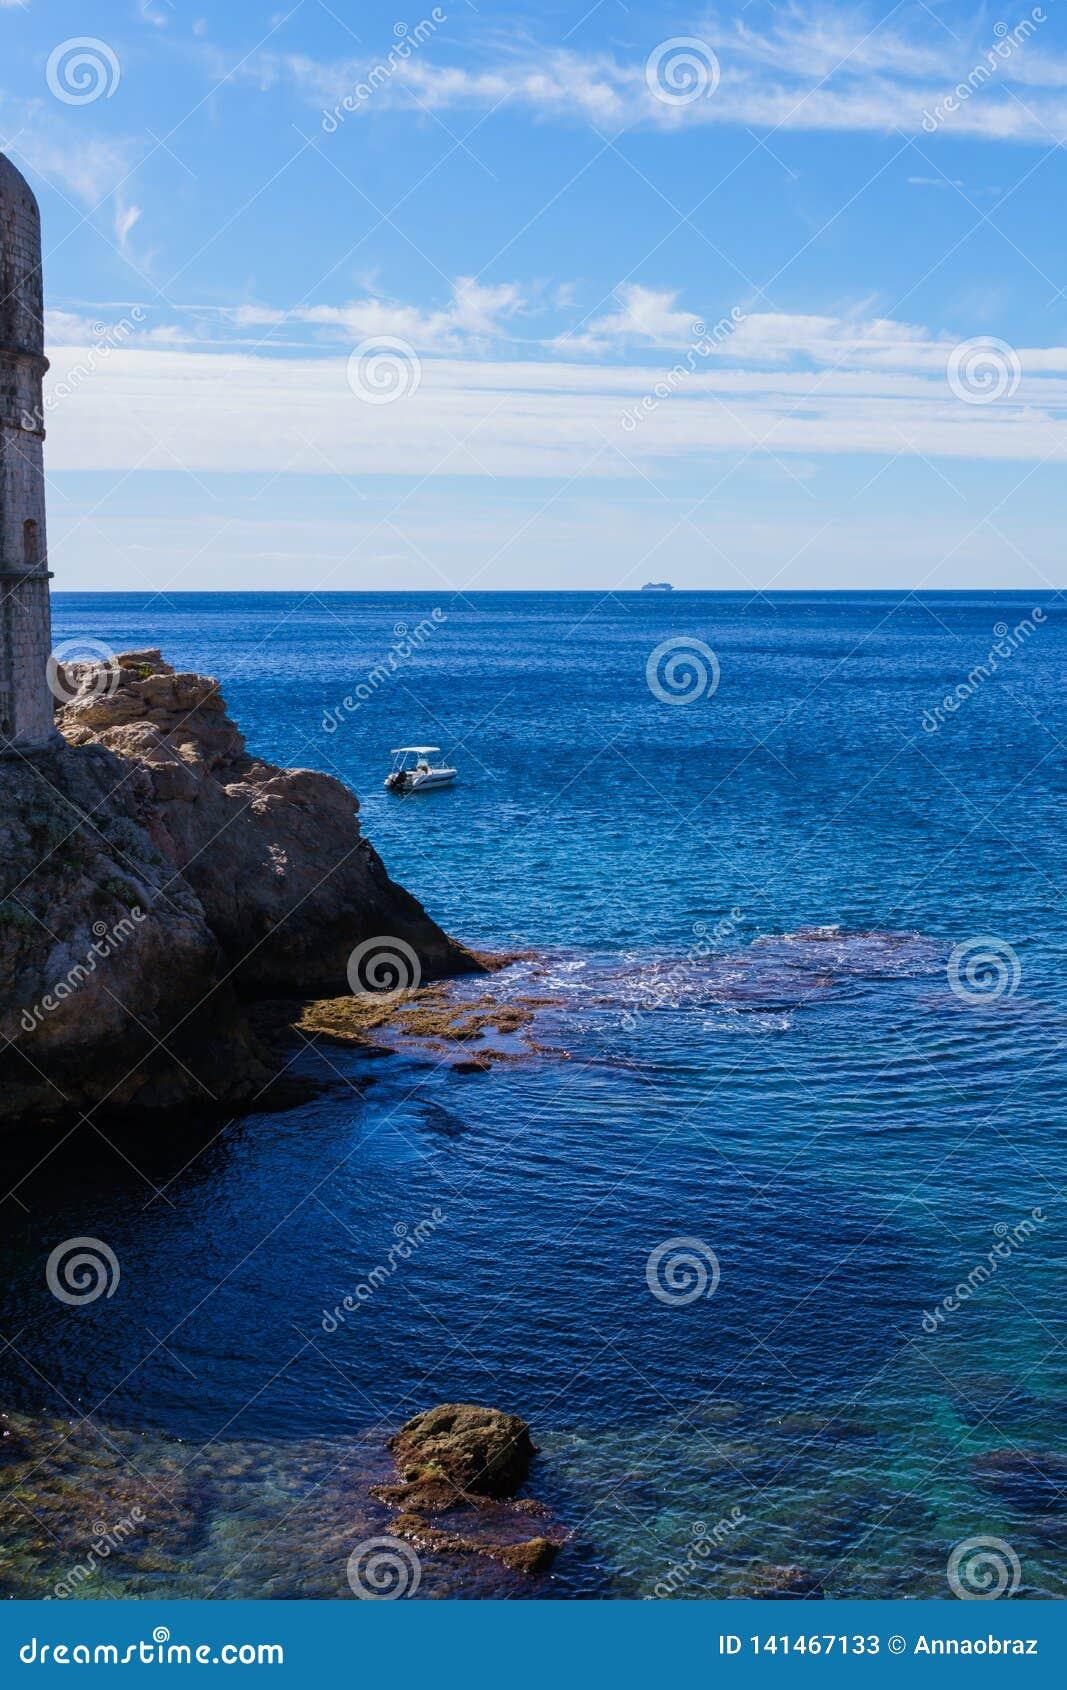 Rocks around the fortress walls in Dubrovnik, Croatia,September 2018